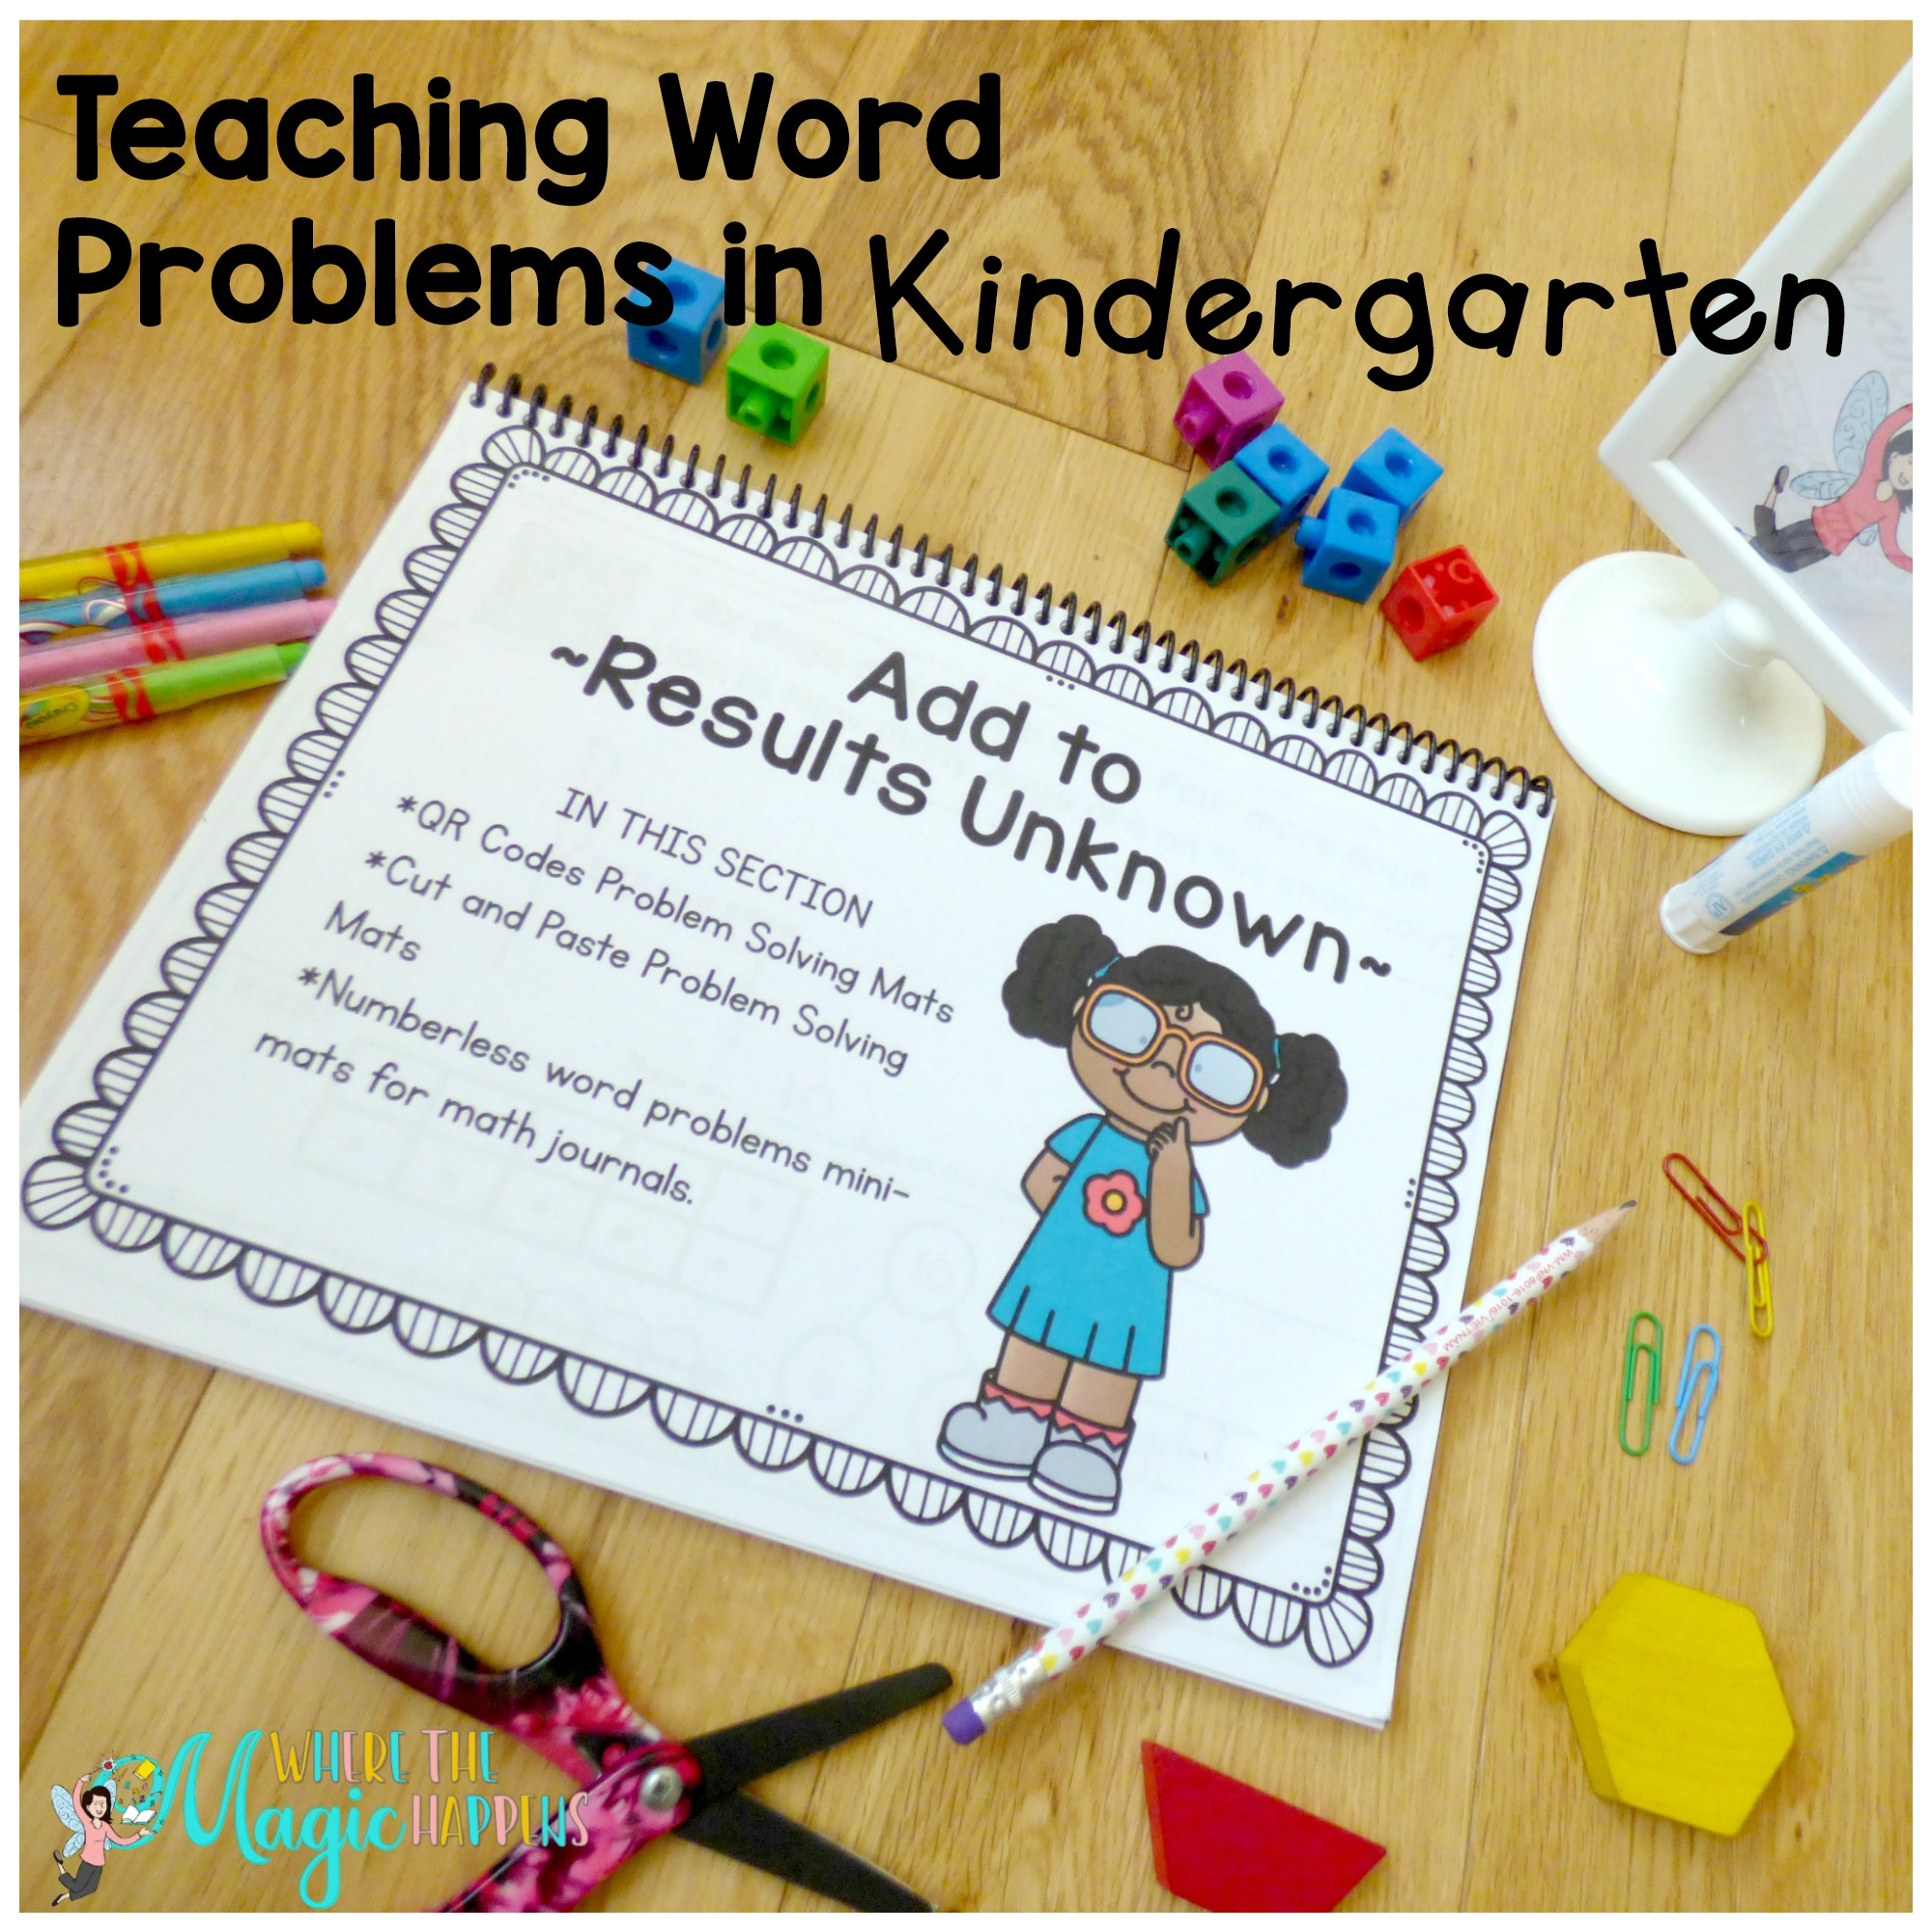 Teaching Word Problems in Kindergarten - Where the Magic Happens